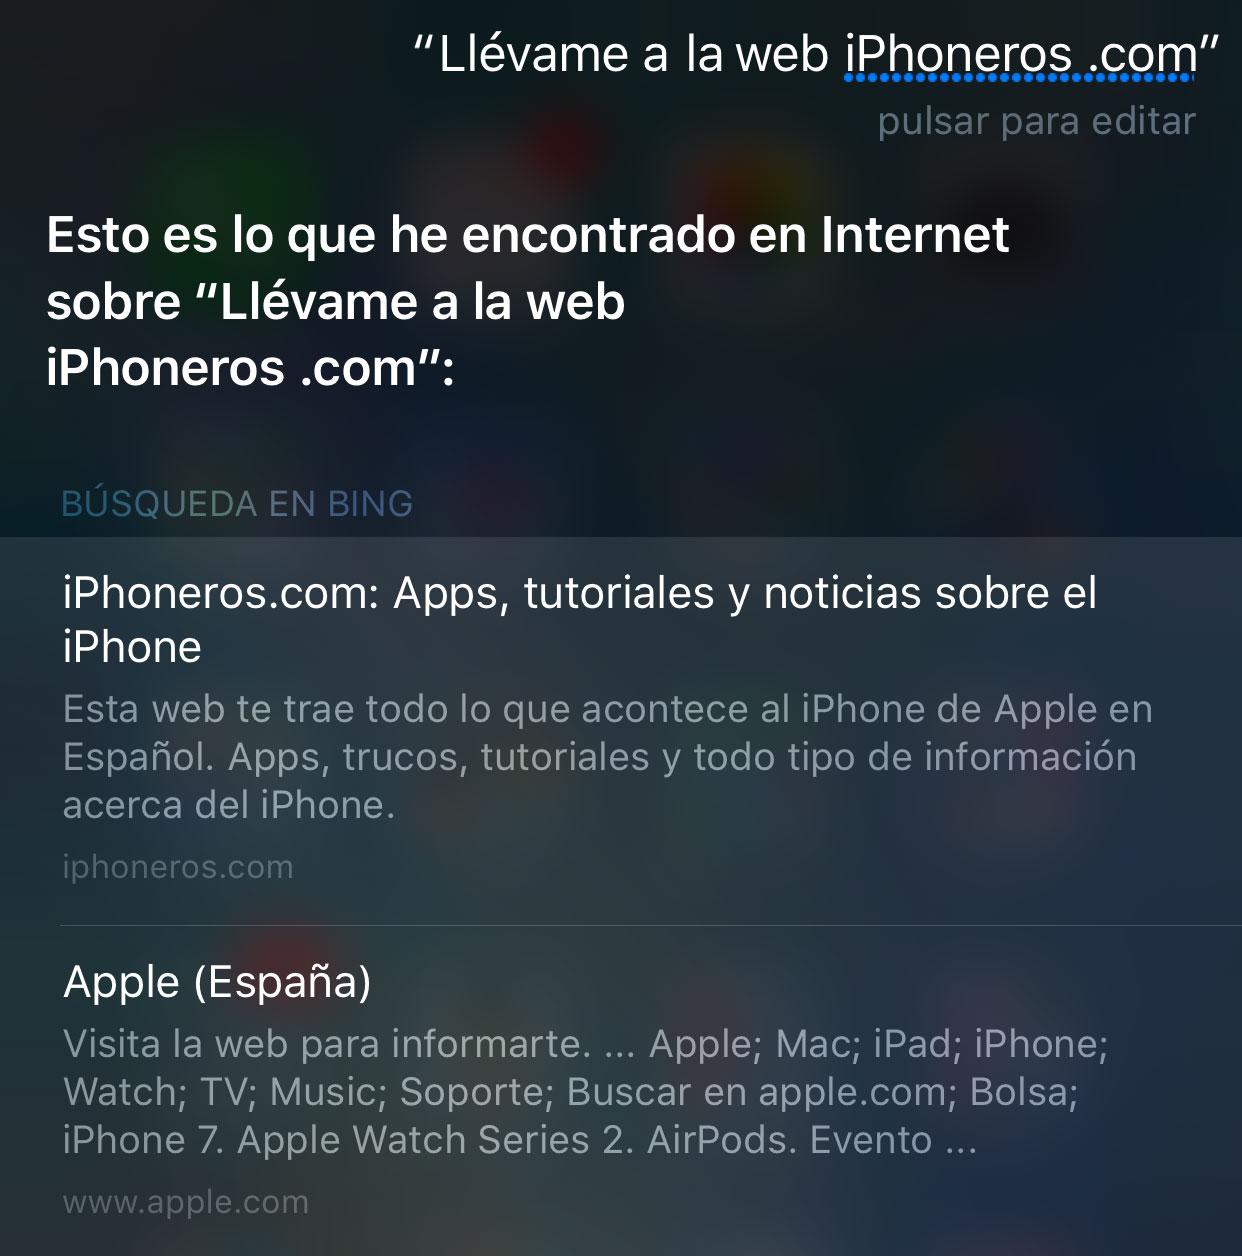 Siri no es capaz de identificar webs